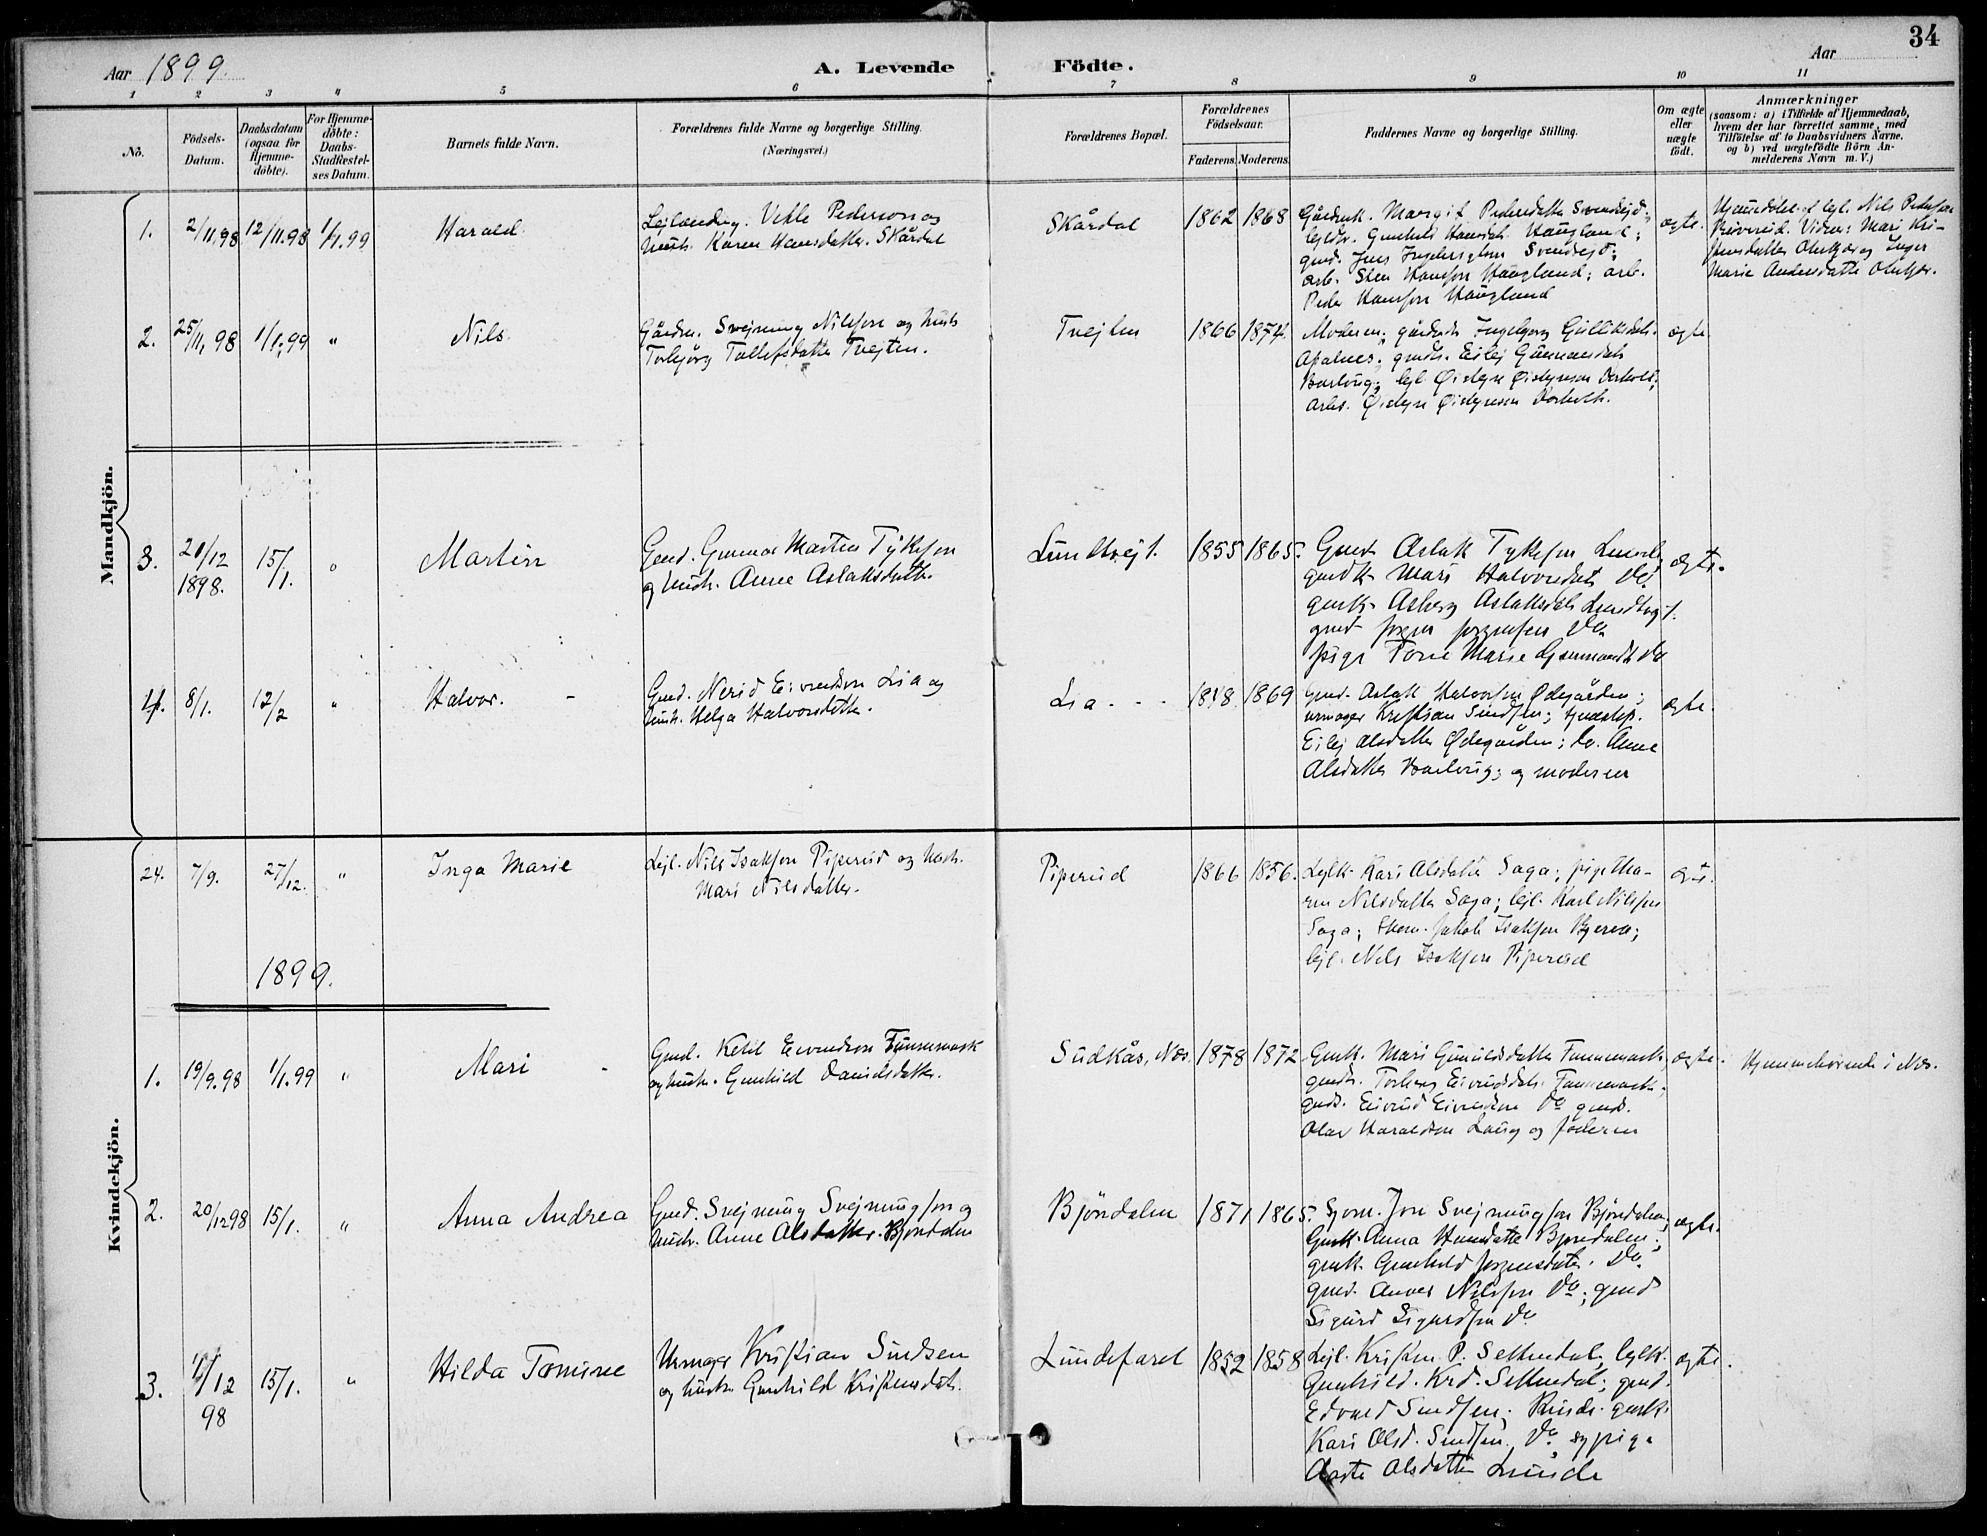 SAKO, Lunde kirkebøker, F/Fa/L0003: Ministerialbok nr. I 3, 1893-1902, s. 34